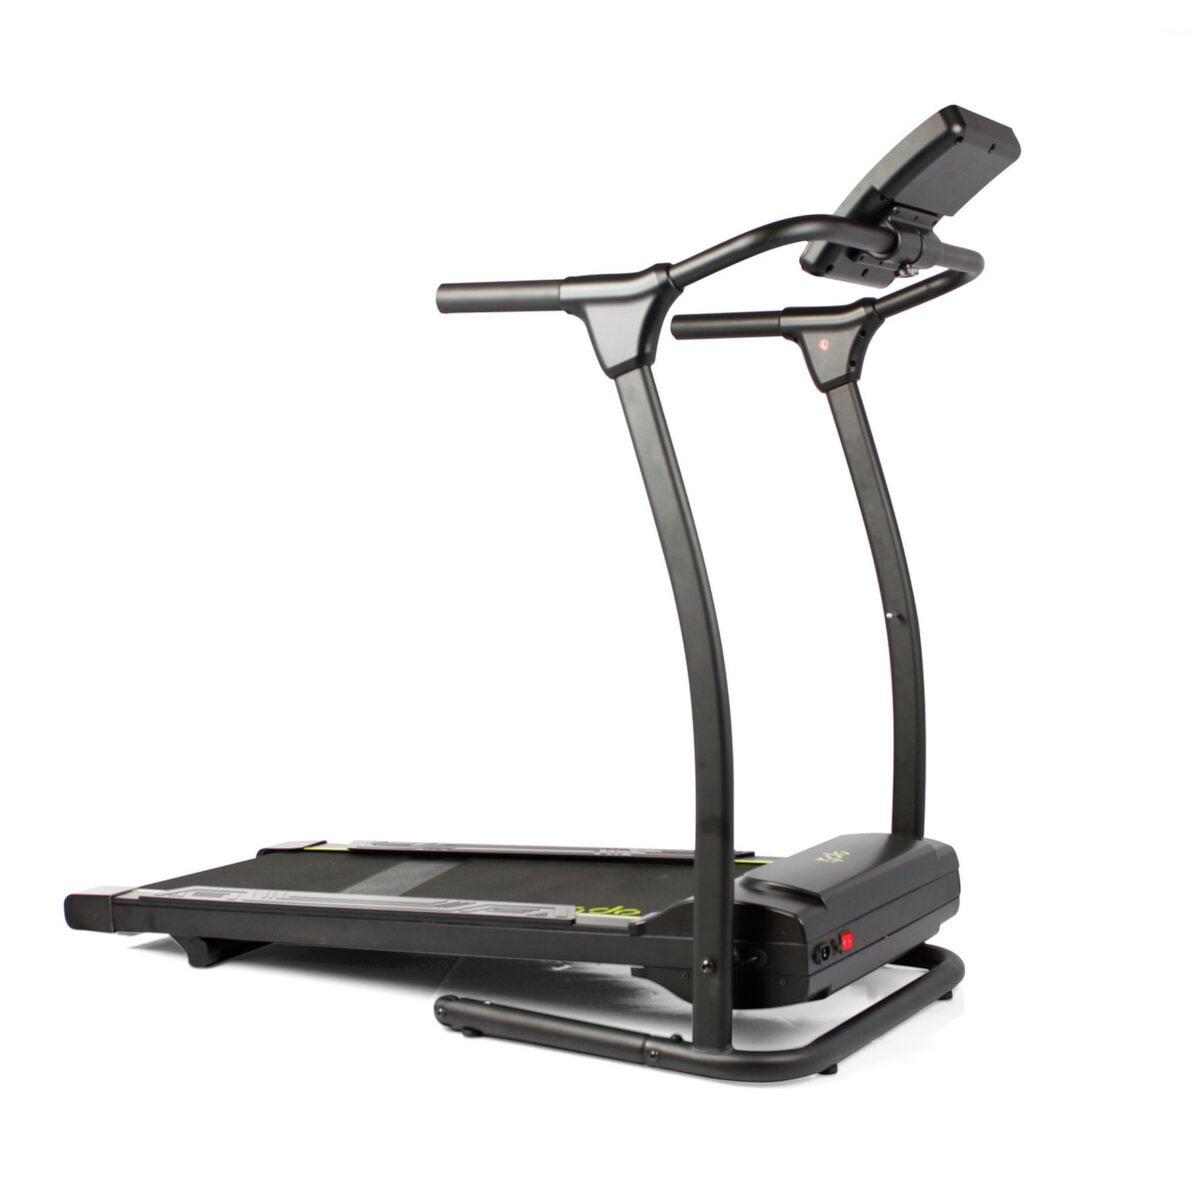 Opti Motorised Walking Treadmill in black and yellow